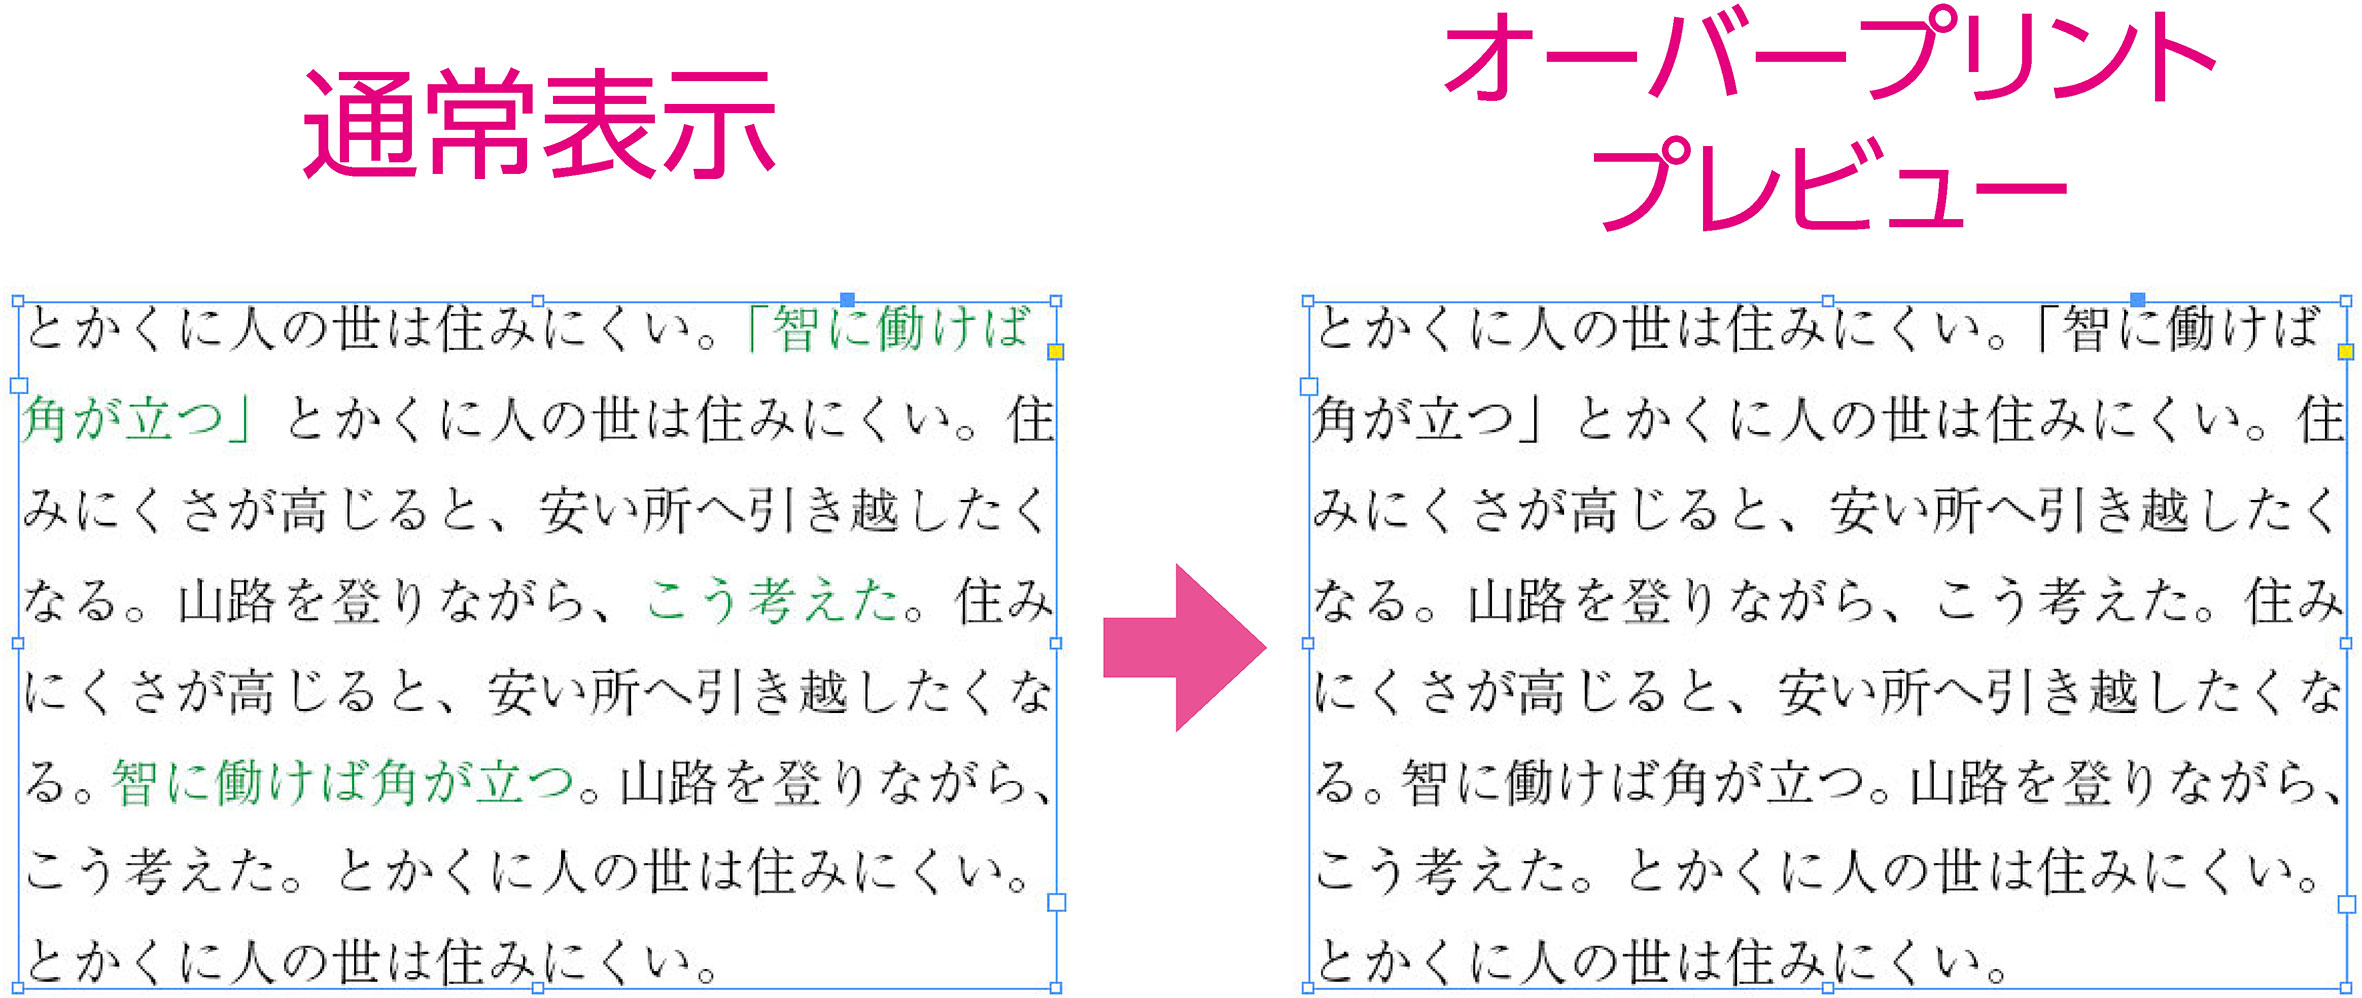 su_06.jpg